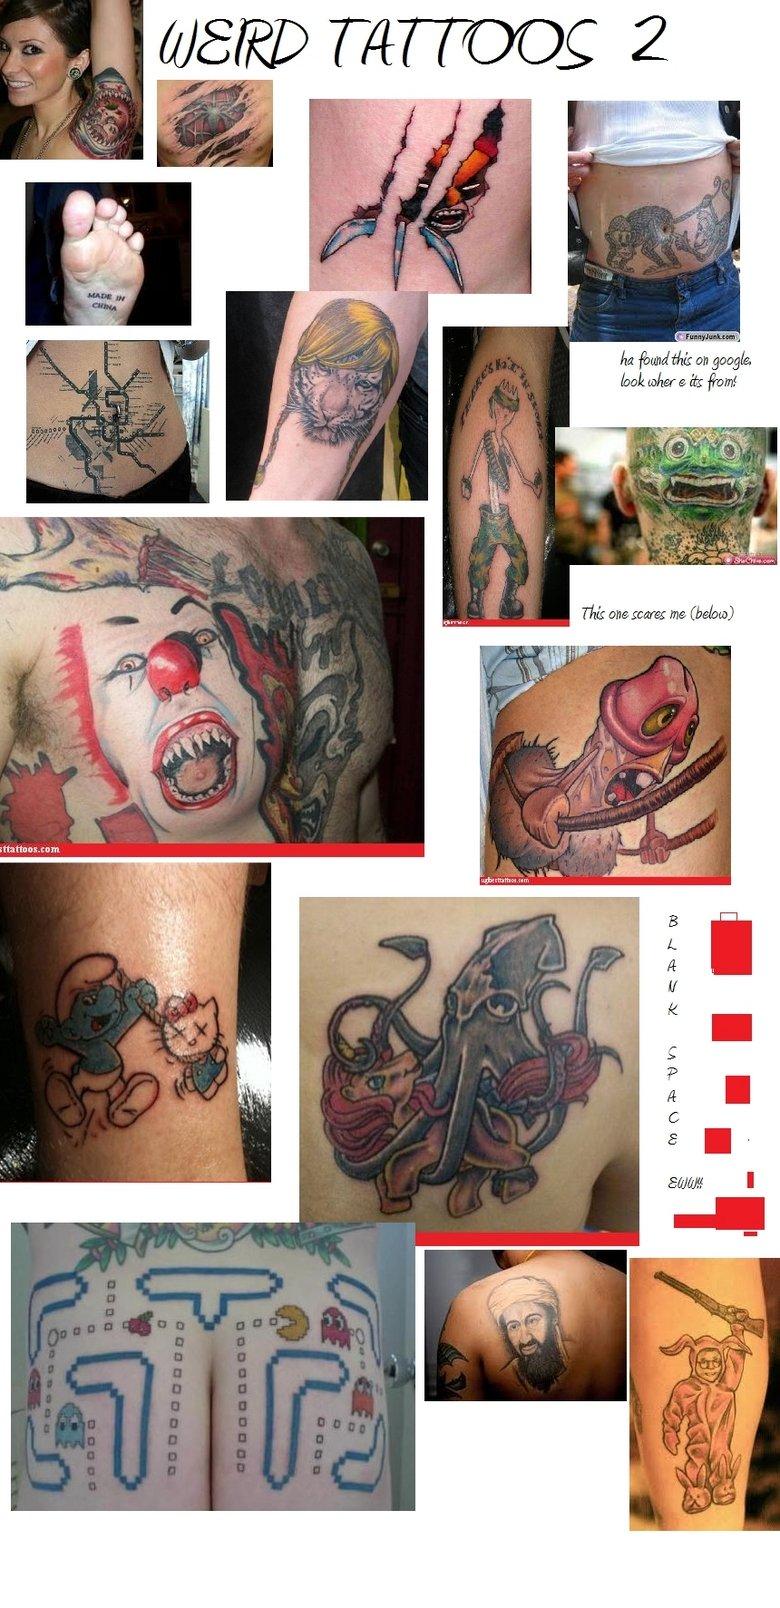 Weird Tattoos 2. heres number two . dll ,llooll! on lla% ea llooll [ weird tattoos